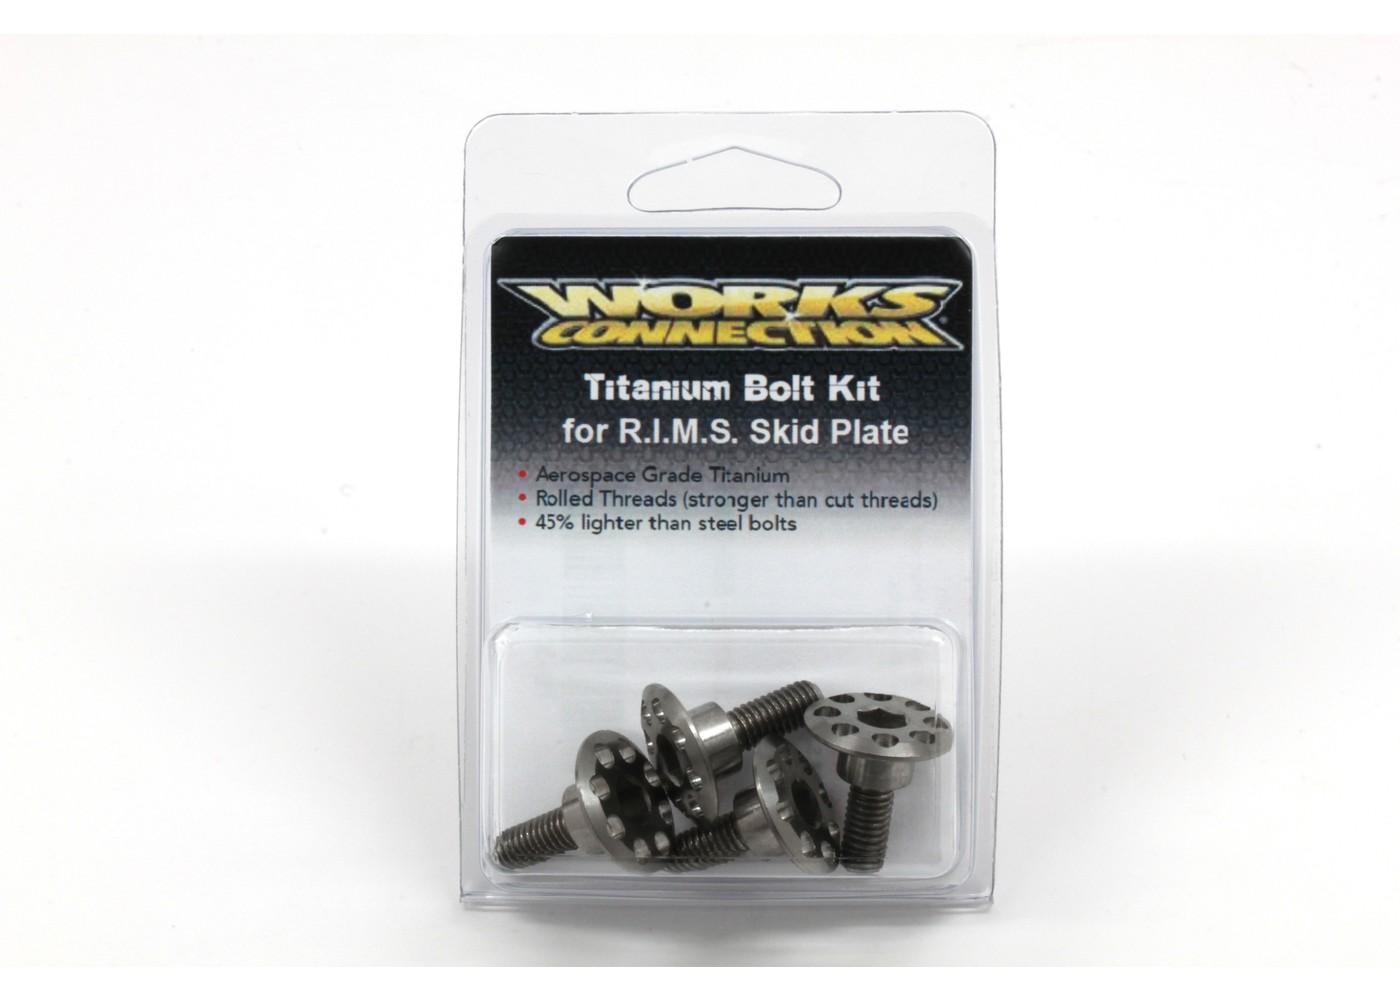 SKid Plate w RIMS System Titanium Bolt Kit - worksconnection com